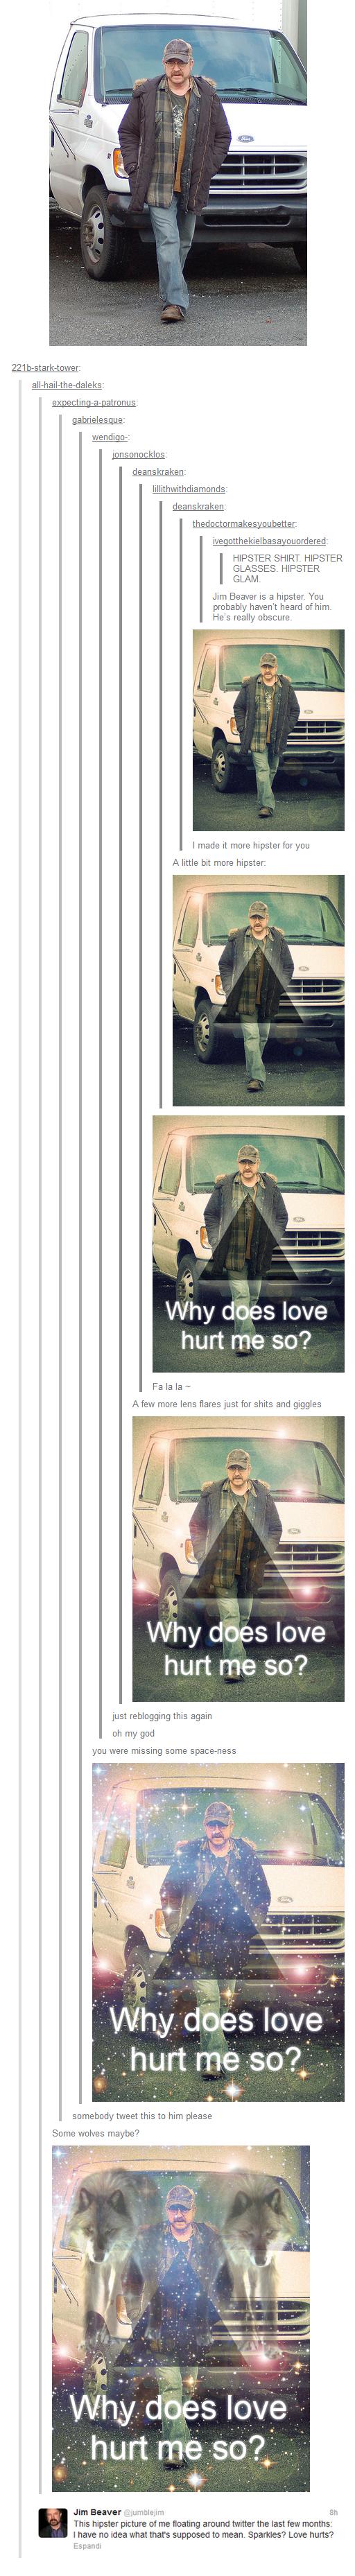 Tumblr did funny. . Tumblr did funny